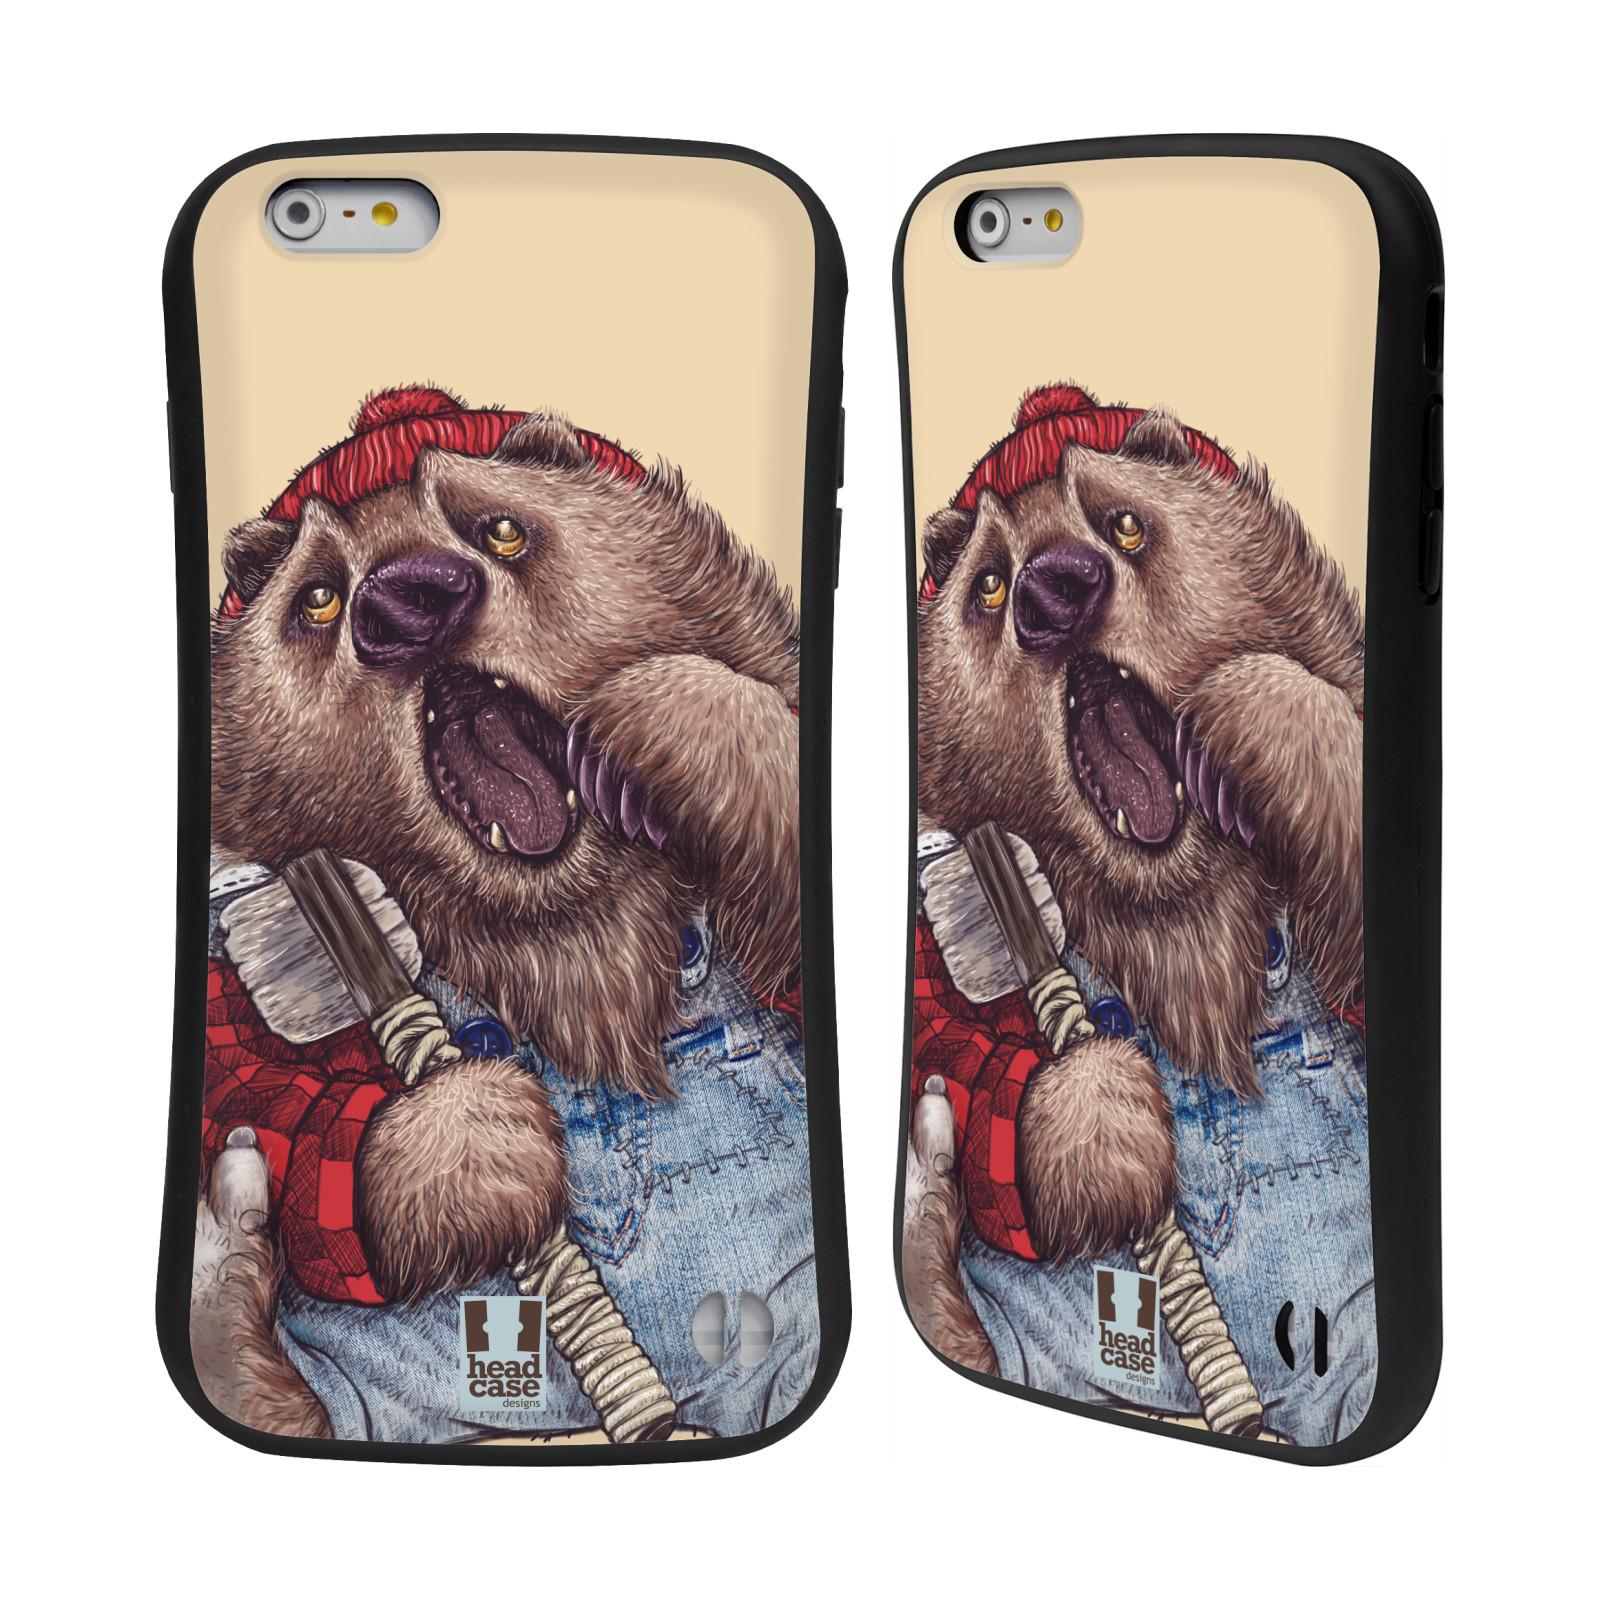 HEAD CASE silikon/plast odolný obal na mobil Apple Iphone 6 PLUS / 6S PLUS vzor Kreslená zvířátka medvěd